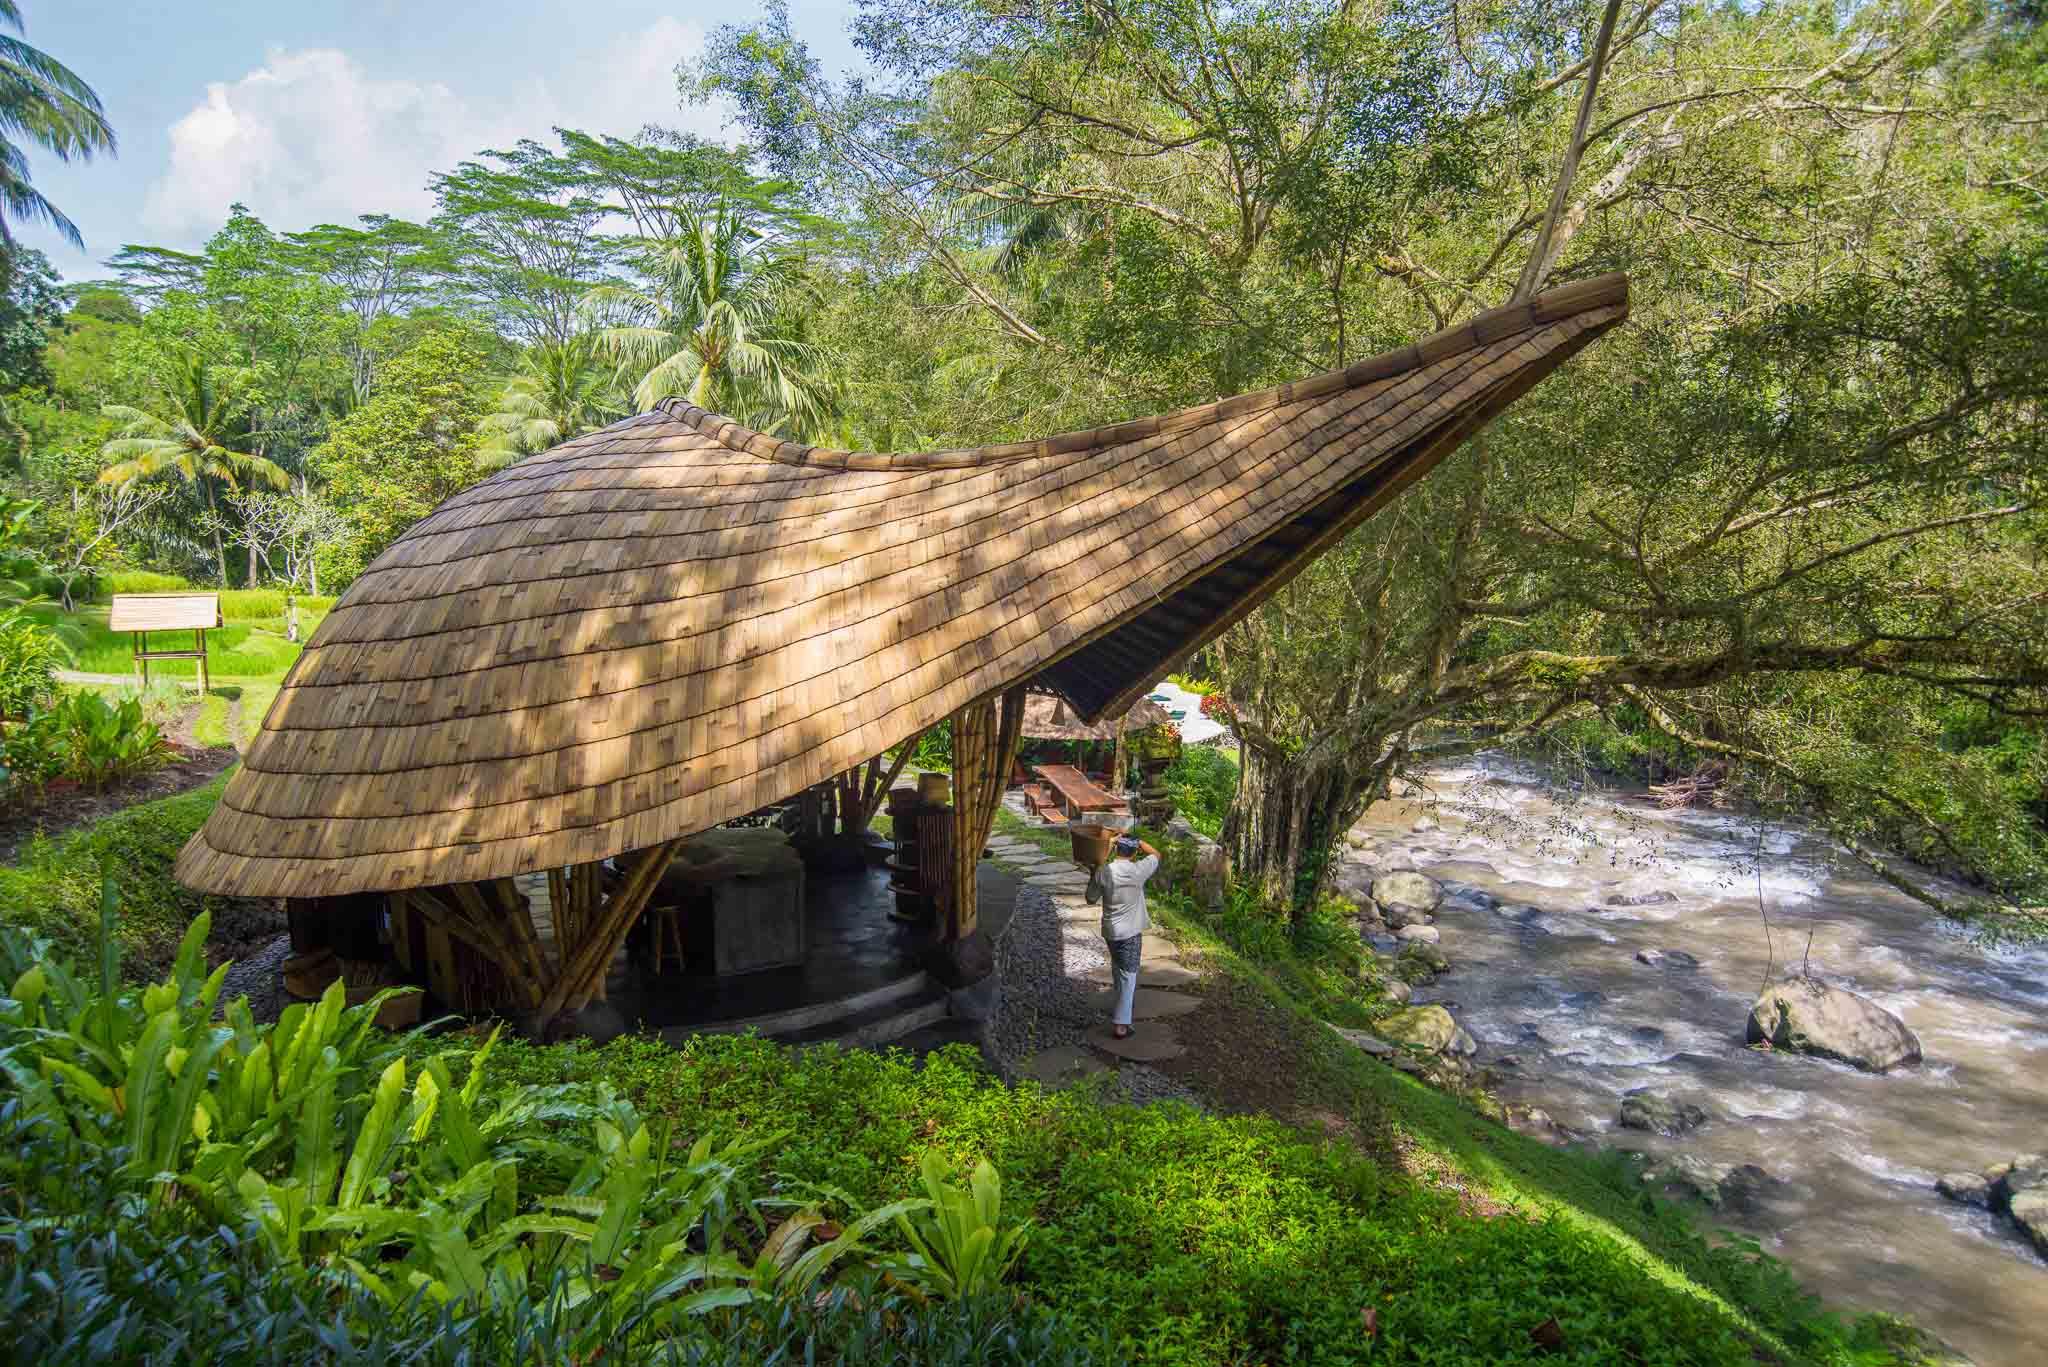 Agung Budi Raharsa | Architecture & Engineering Sokasi Bamboo Cooking Class / School - Bali Bali, Indonesia Bali, Indonesia Elevation Tropical 88743